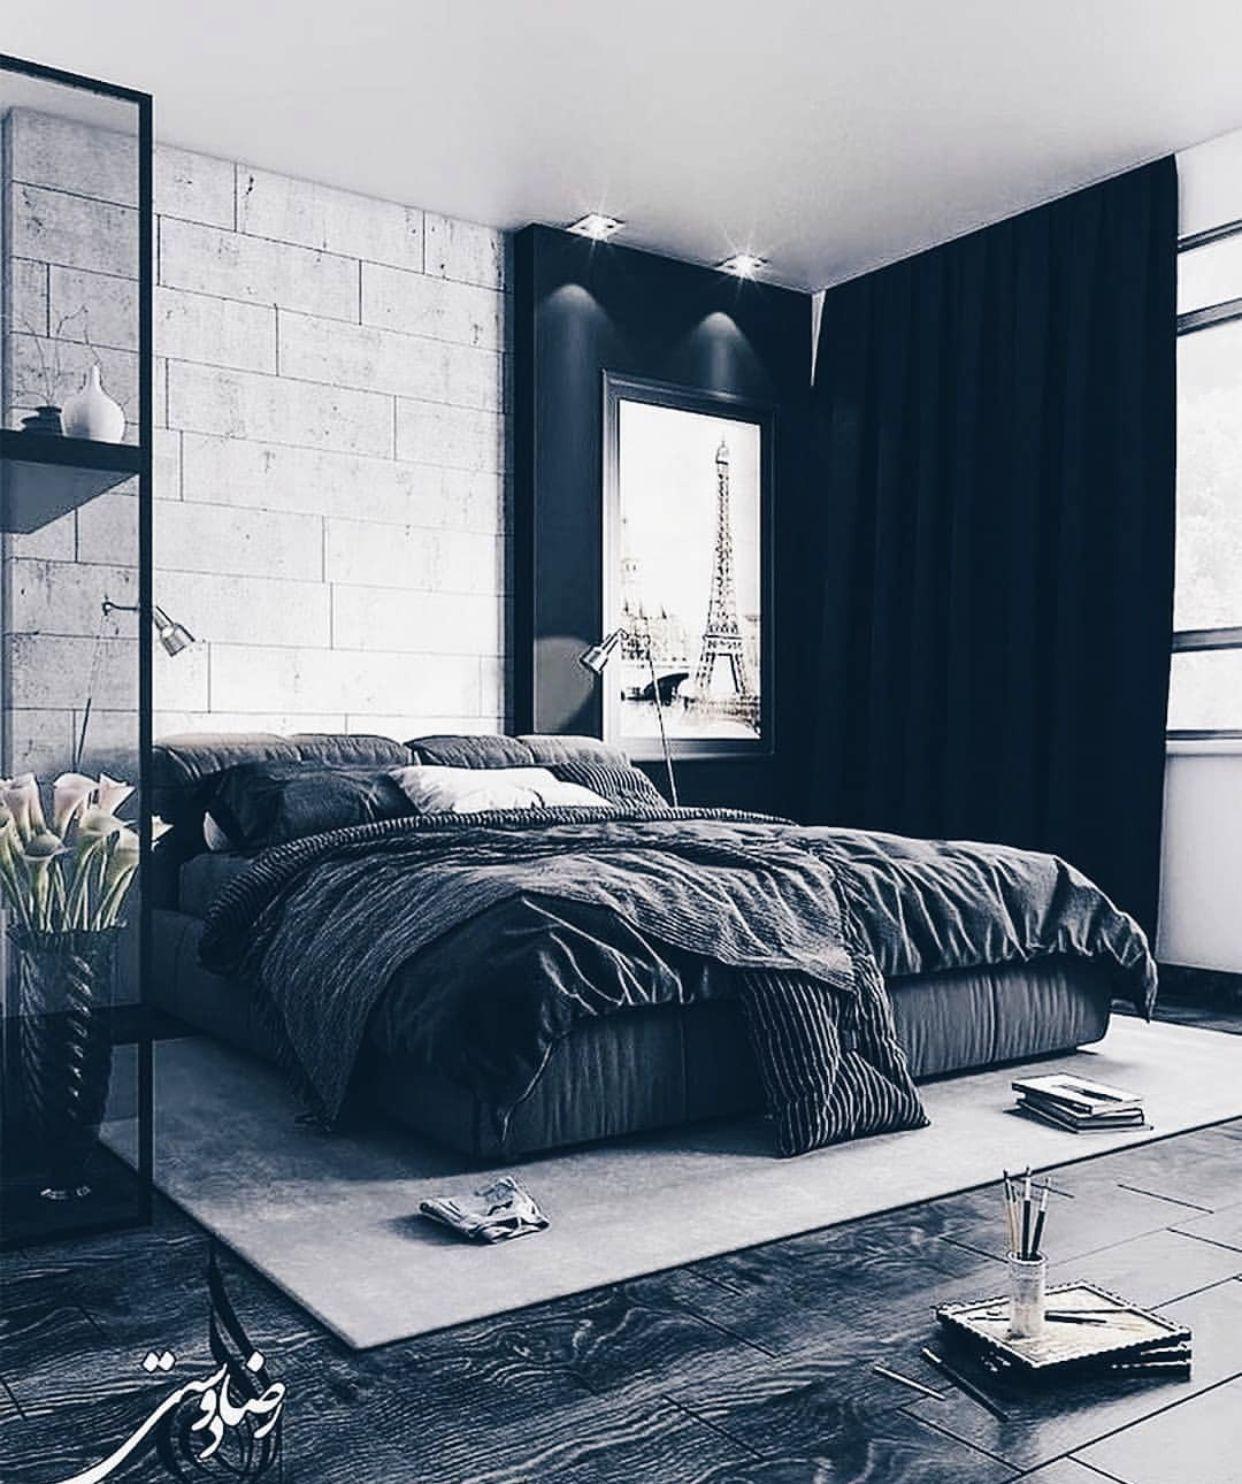 Stylish Master Bedroom Decorating Ideas Luxury Bedroom Master Masculine Interior Design Luxurious Bedrooms